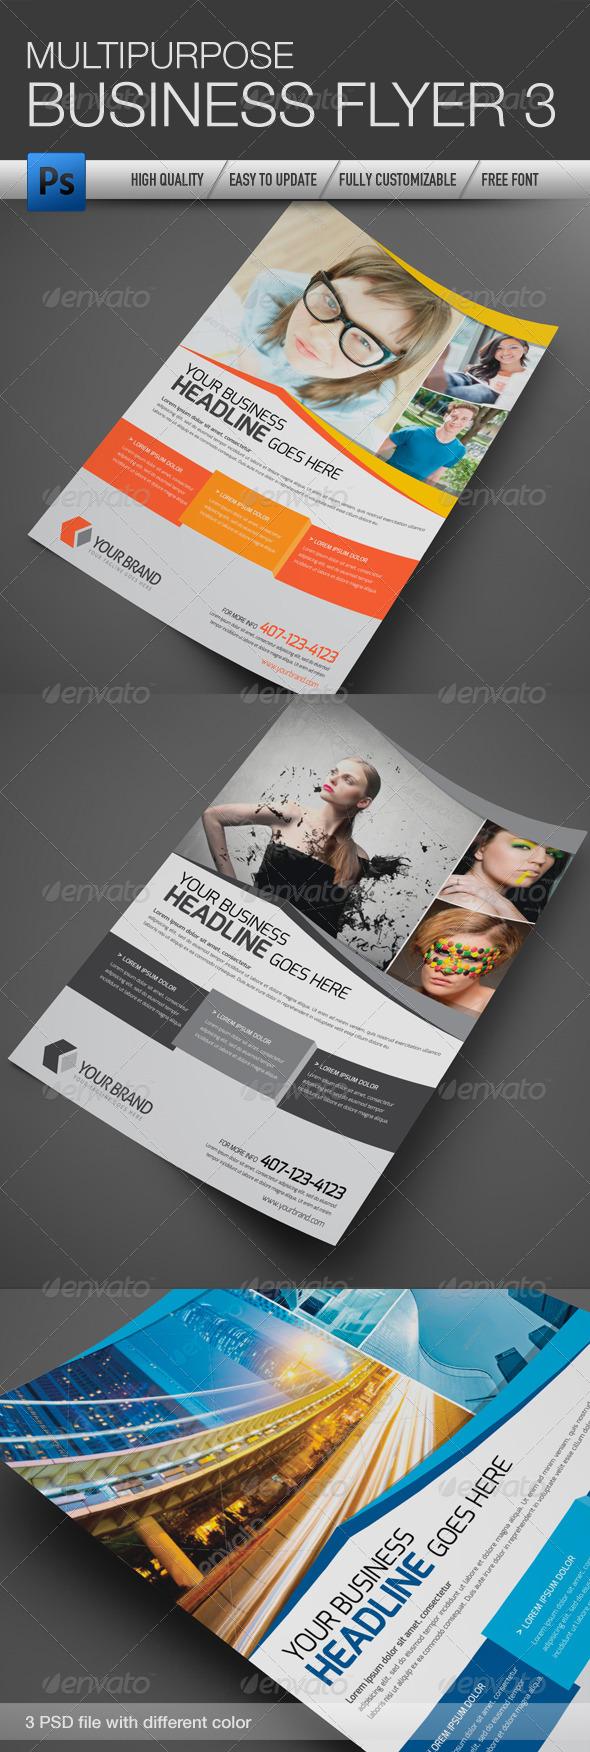 GraphicRiver Multipurpose Business Flyer 3 4673296